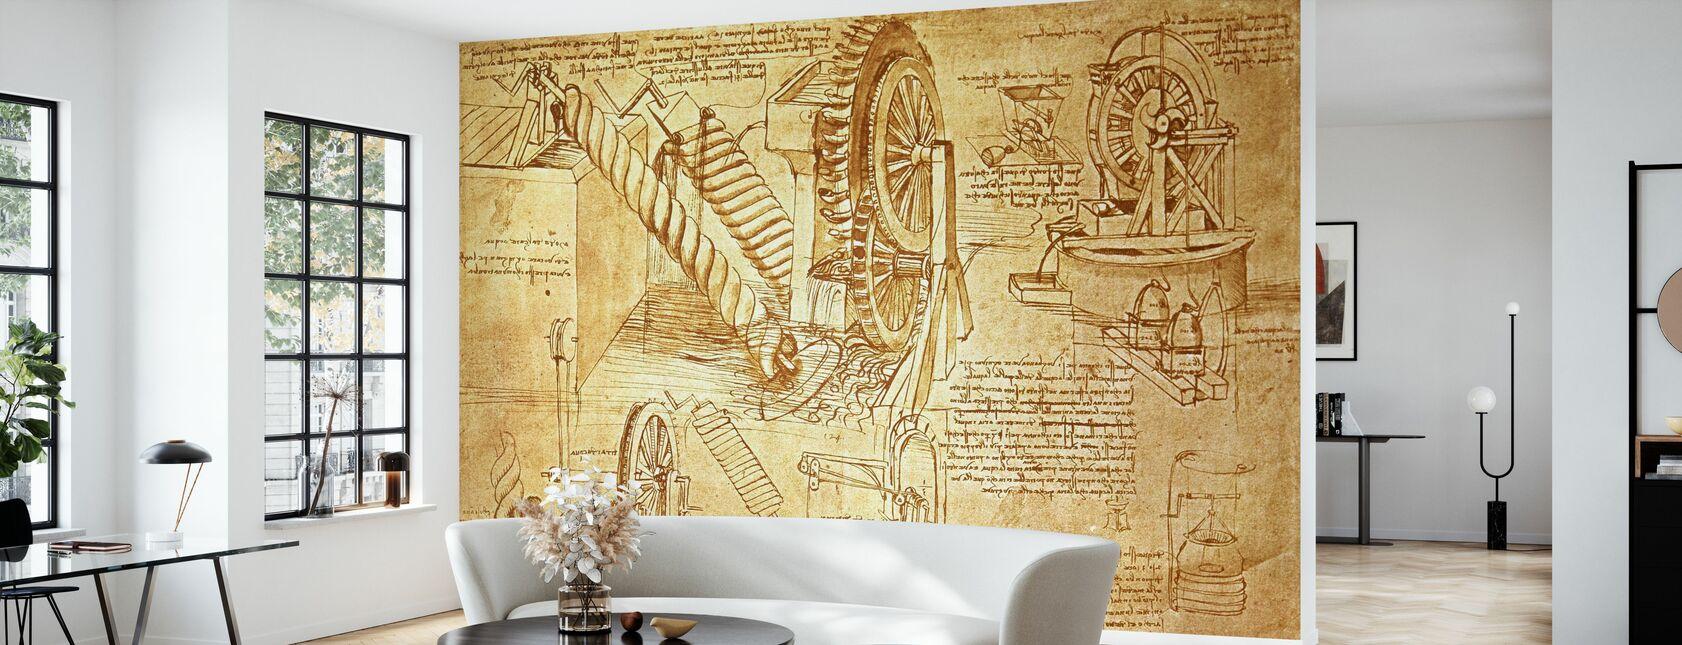 Leonardo da Vinci - Atlanticus - Papier peint - Salle à manger